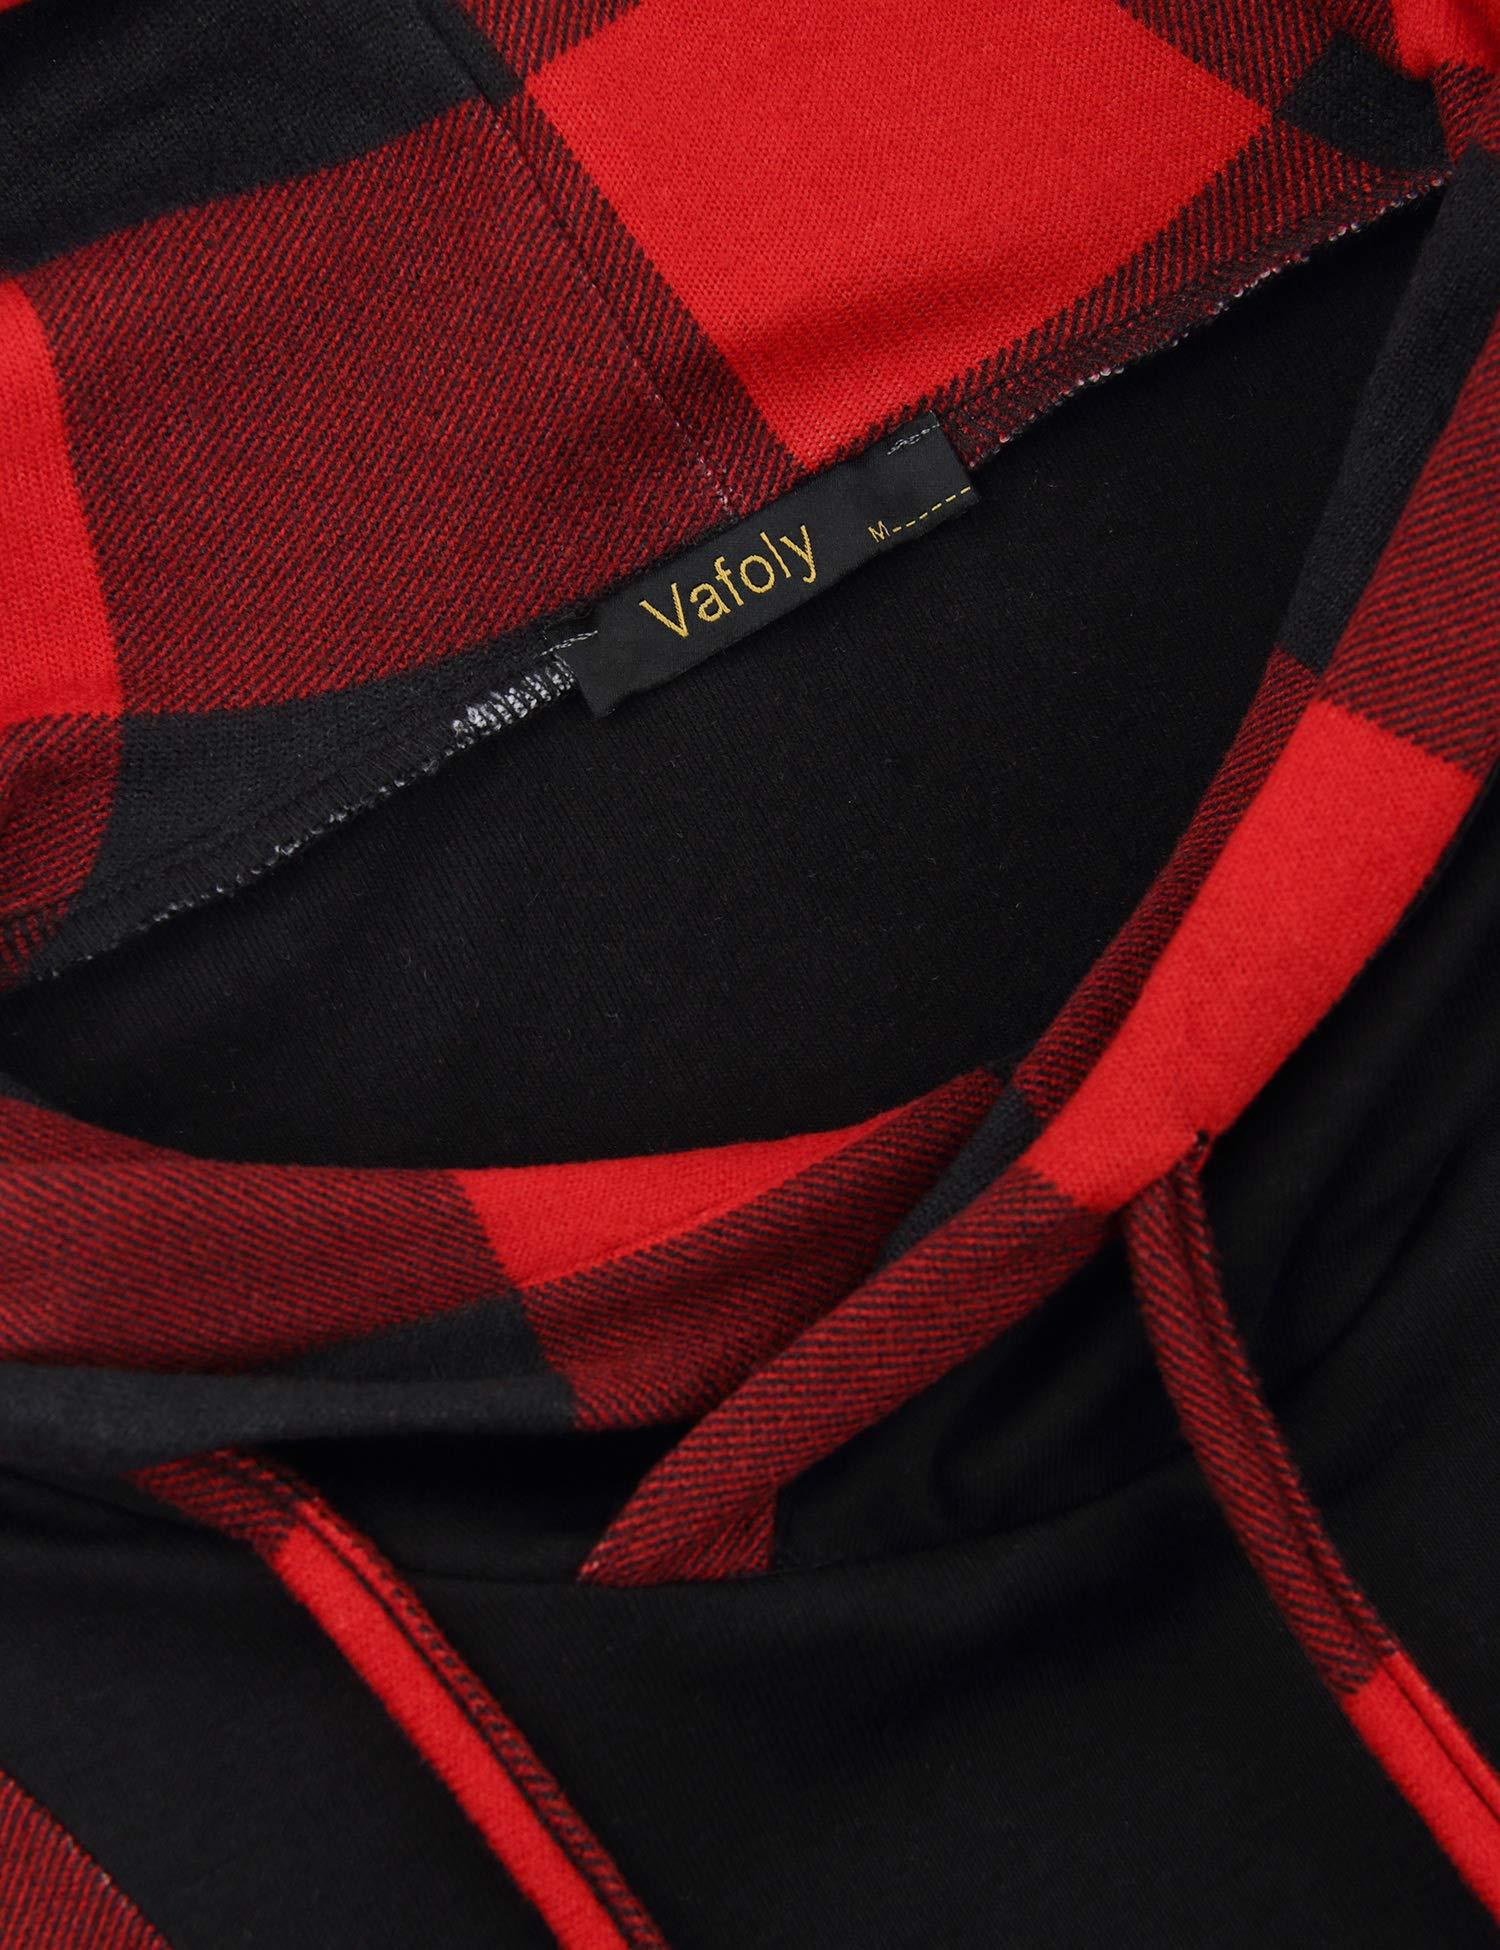 Vafoly Damen Sweatshirt, Winterpulli Wintermantel Übergangsjacke Lässig Langarm Blouson Jacke RollkragenFahsion Schmetterling für Frühling, Herbst,Winter(Rot-schwarz,M)